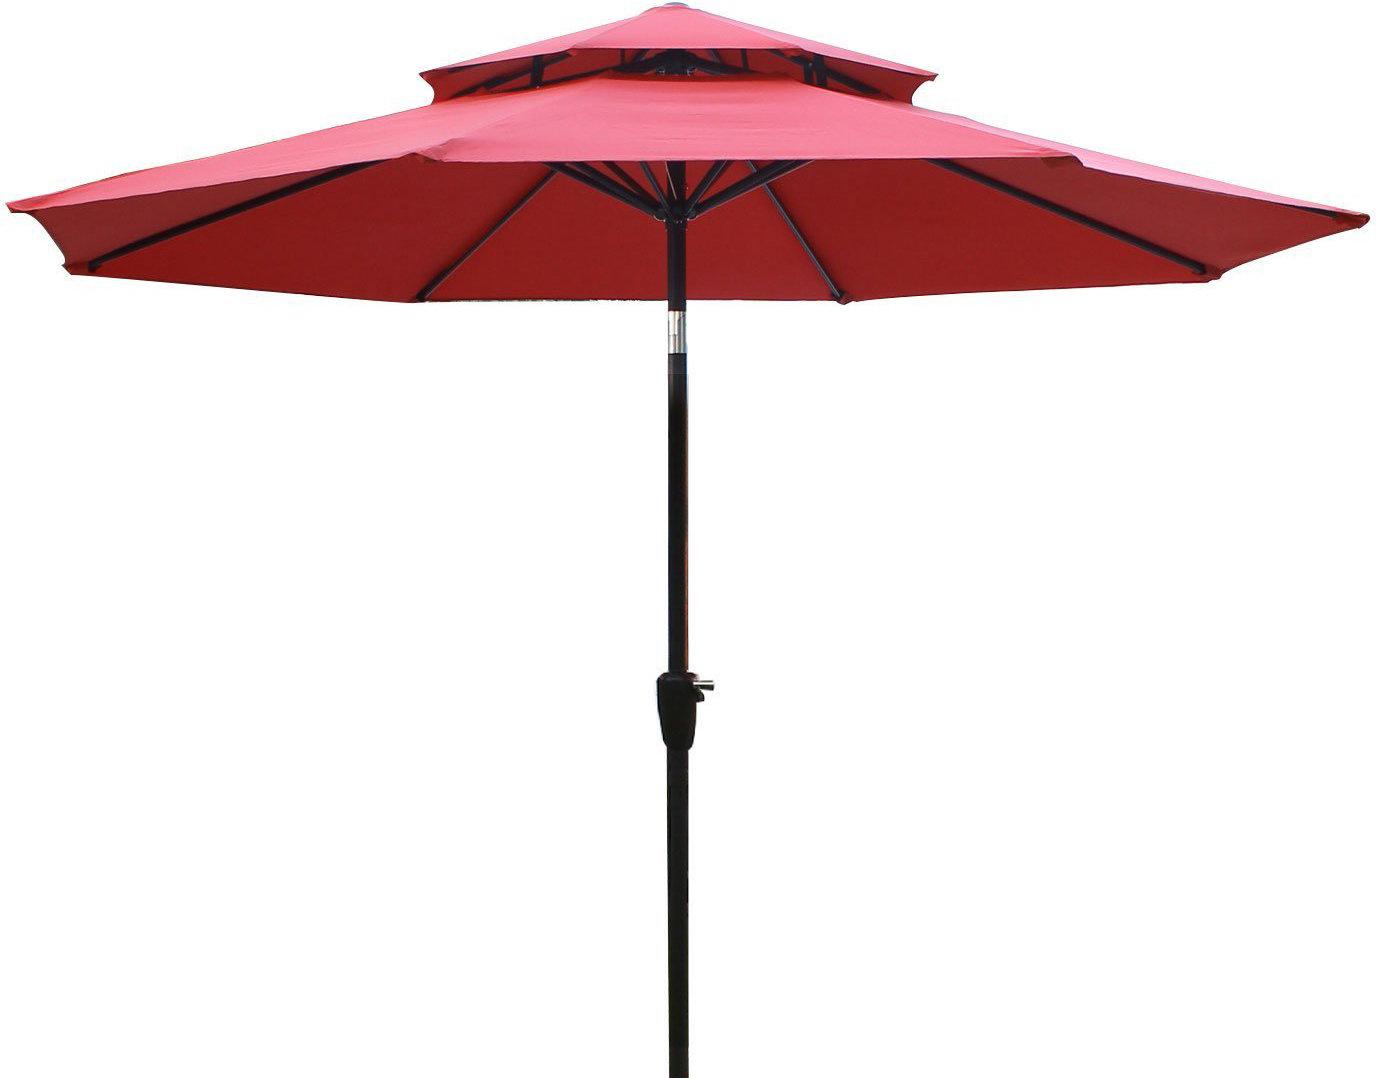 Fashionable Dimond 9' Market Umbrella With Lizarraga Market Umbrellas (View 15 of 20)